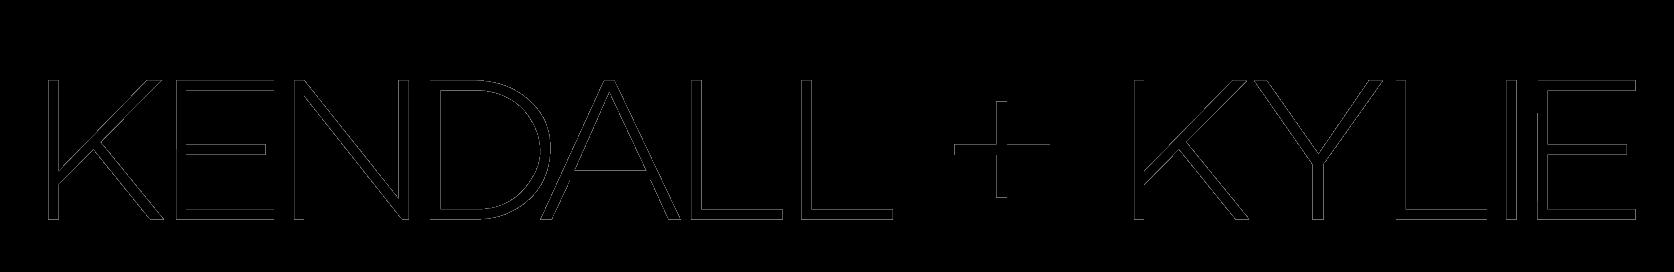 image logowitepng kylie jenner wikia fandom